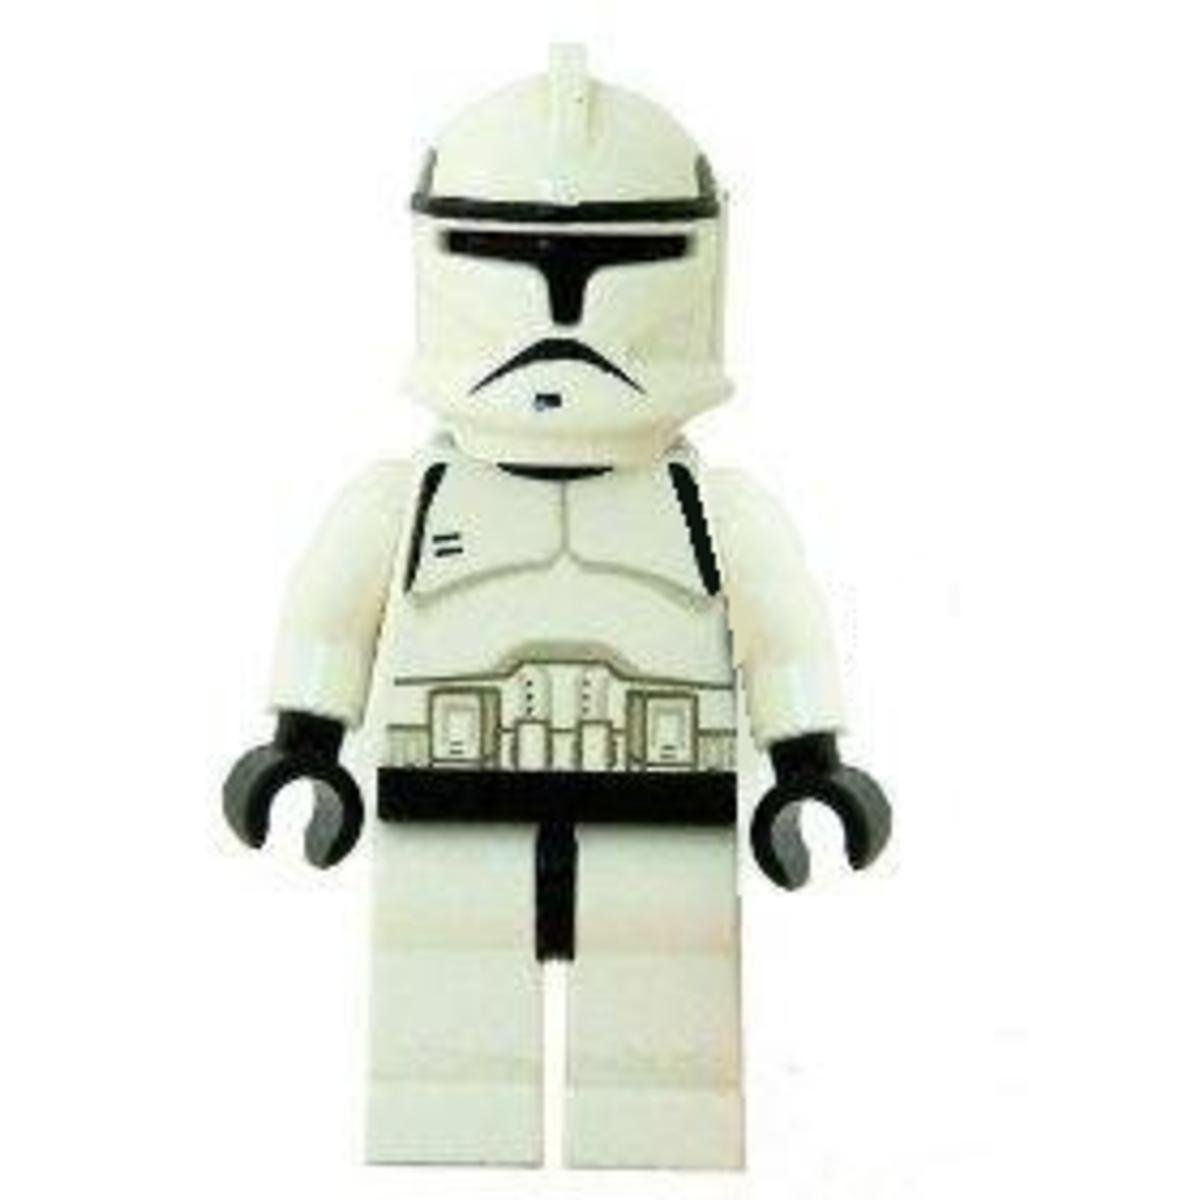 LEGO Star Wars AT-TE 4482 Clone Trooper Minifigure